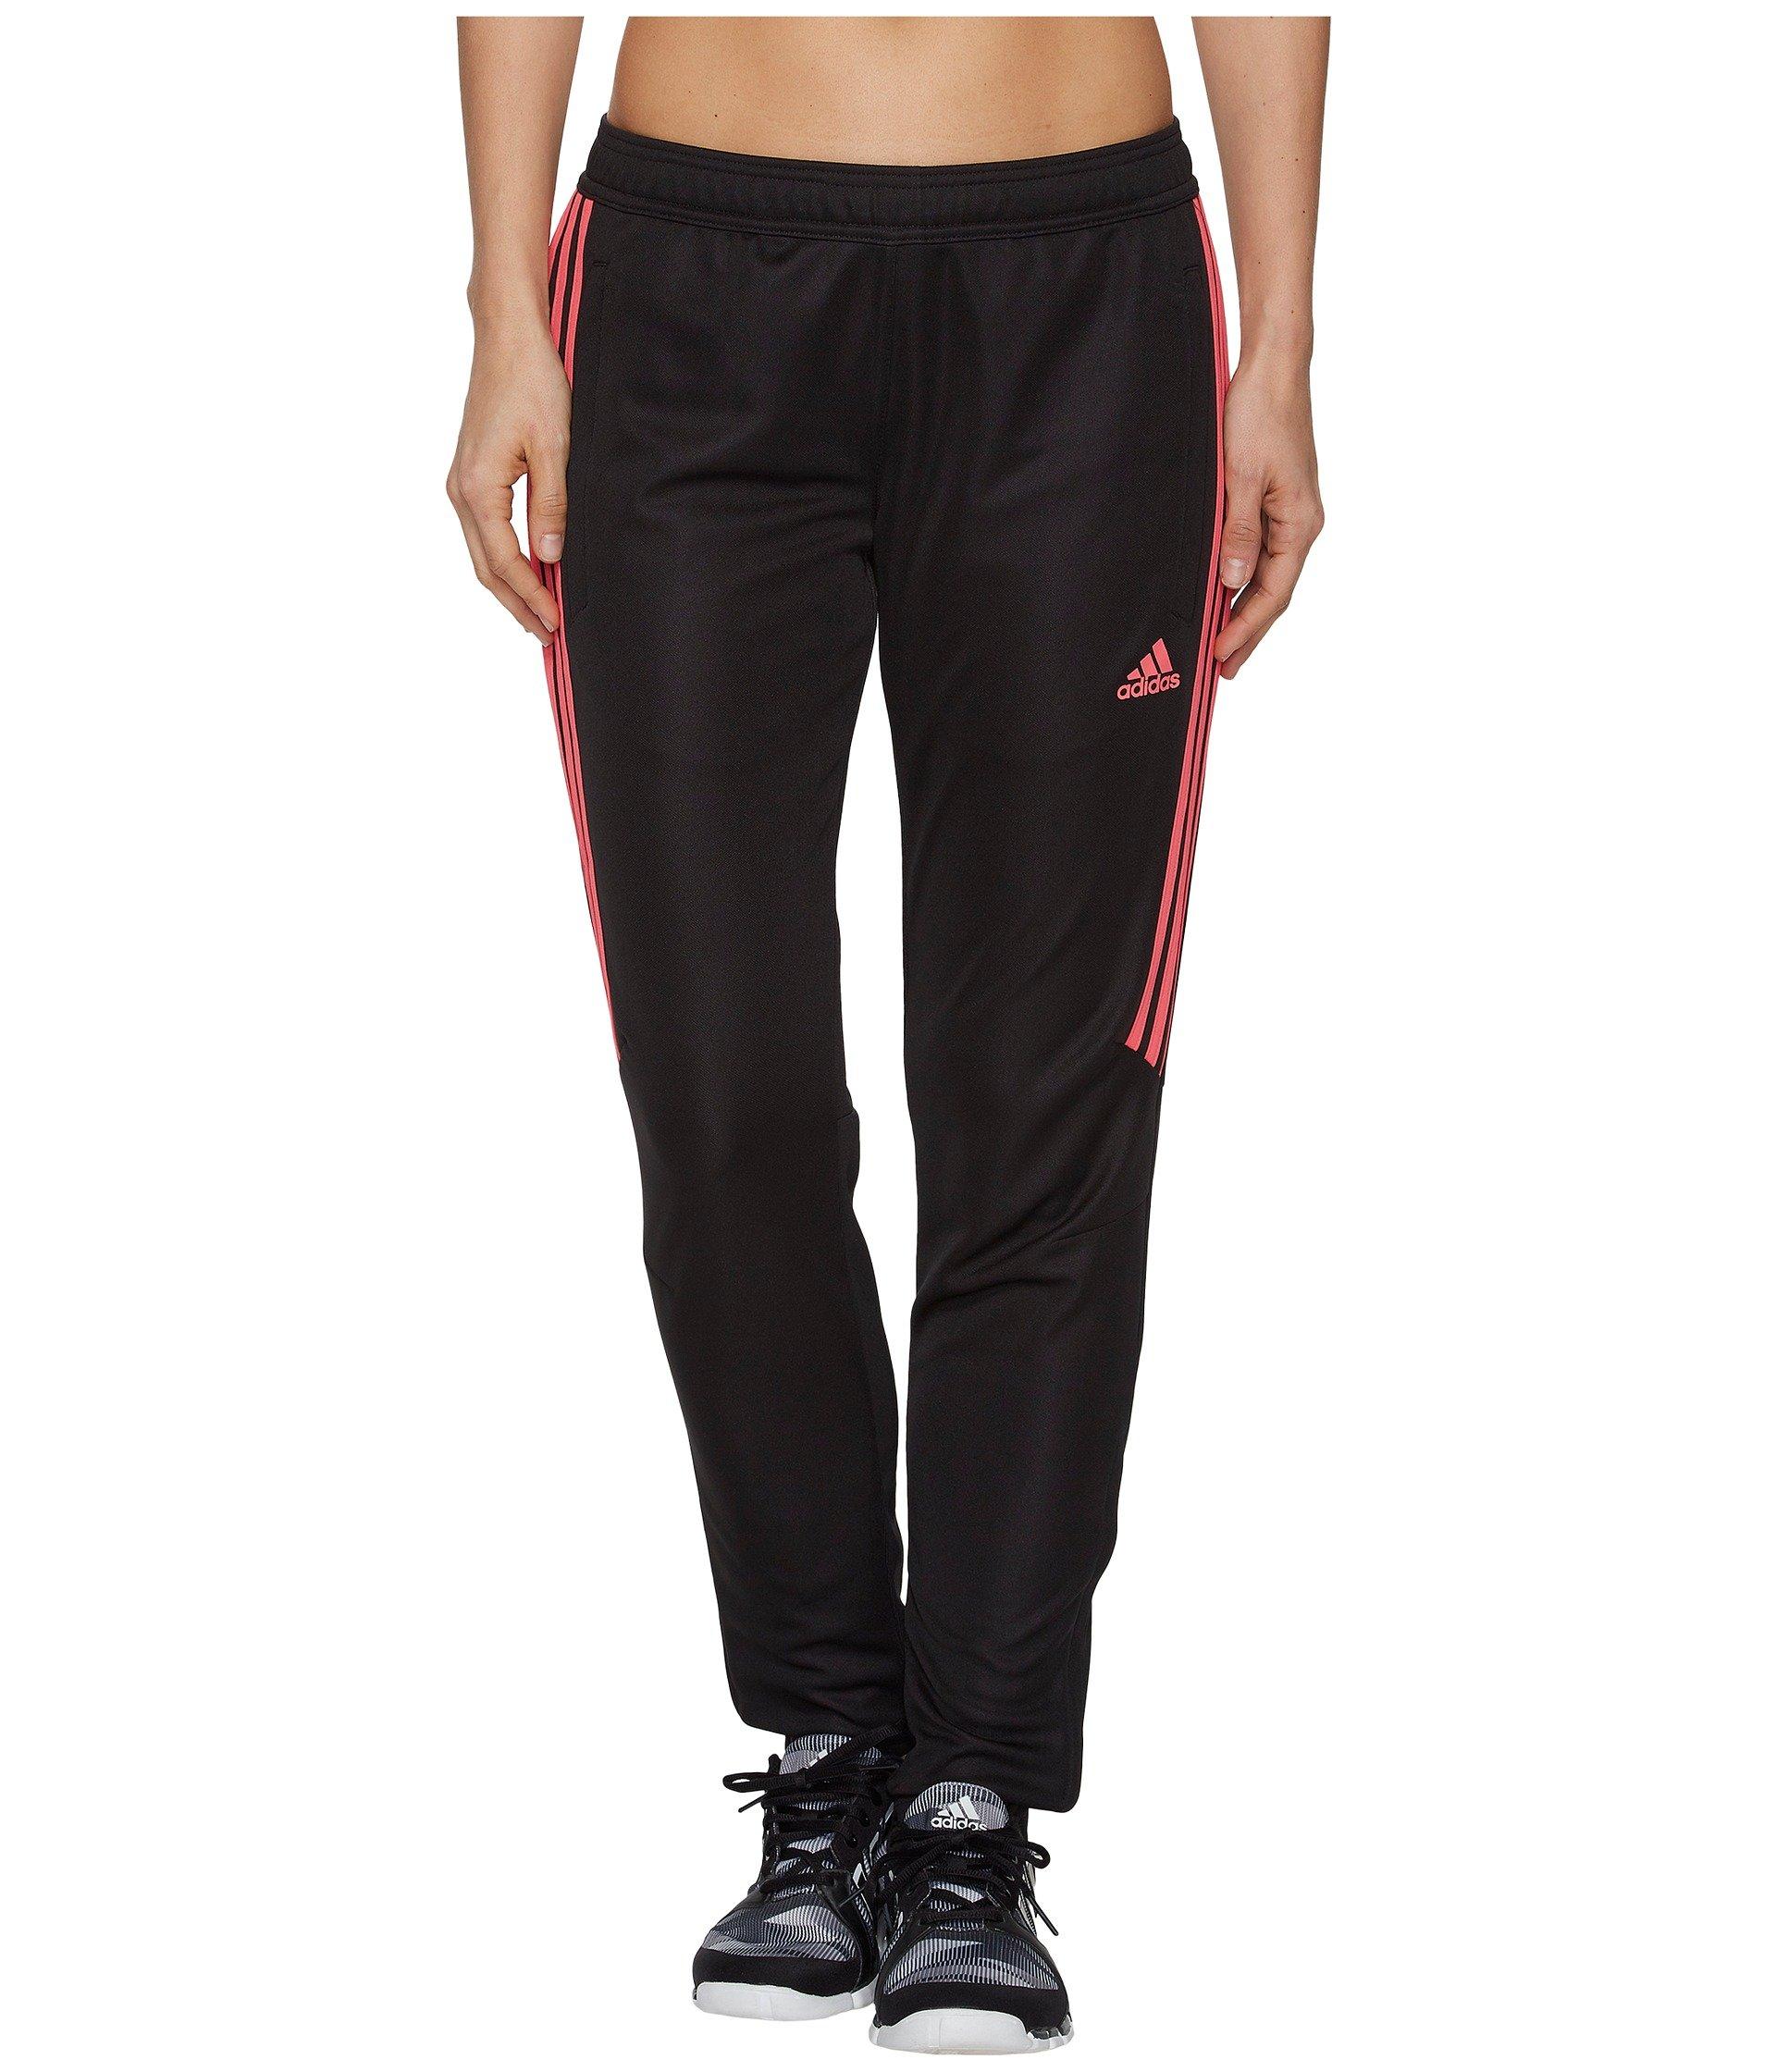 adidas Women's Tiro '17 Pants Black/Real Pink XX-Small 32 32